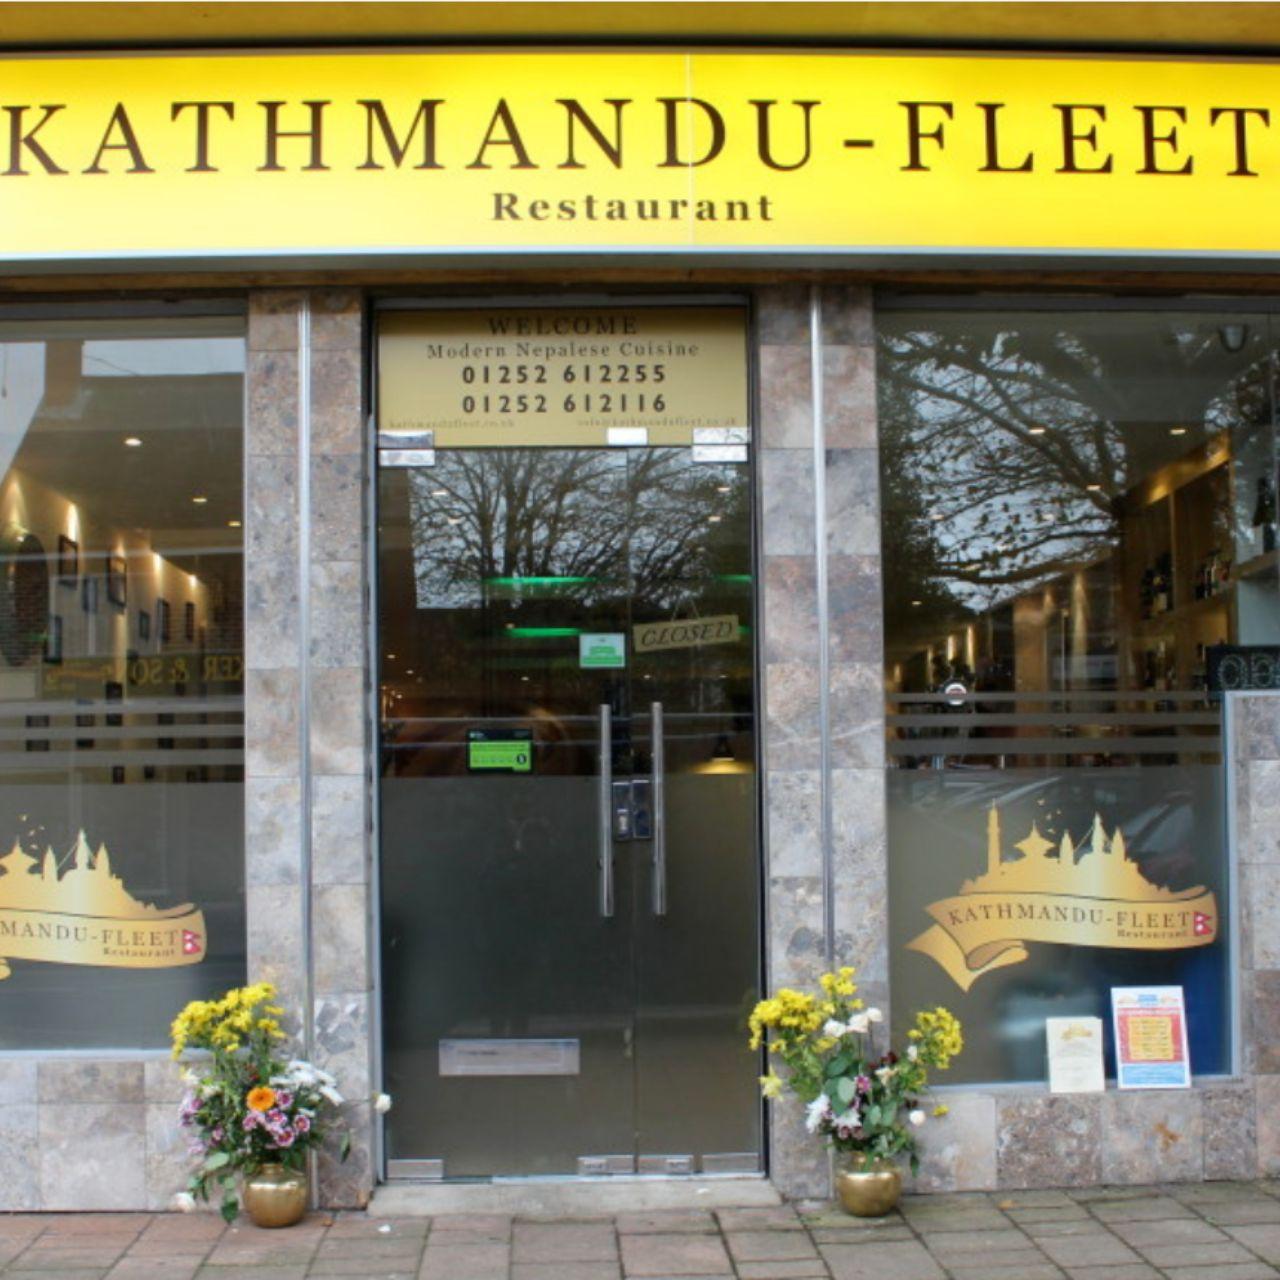 Kathmandu Fleet Restaurant Fleet Hampshire Opentable